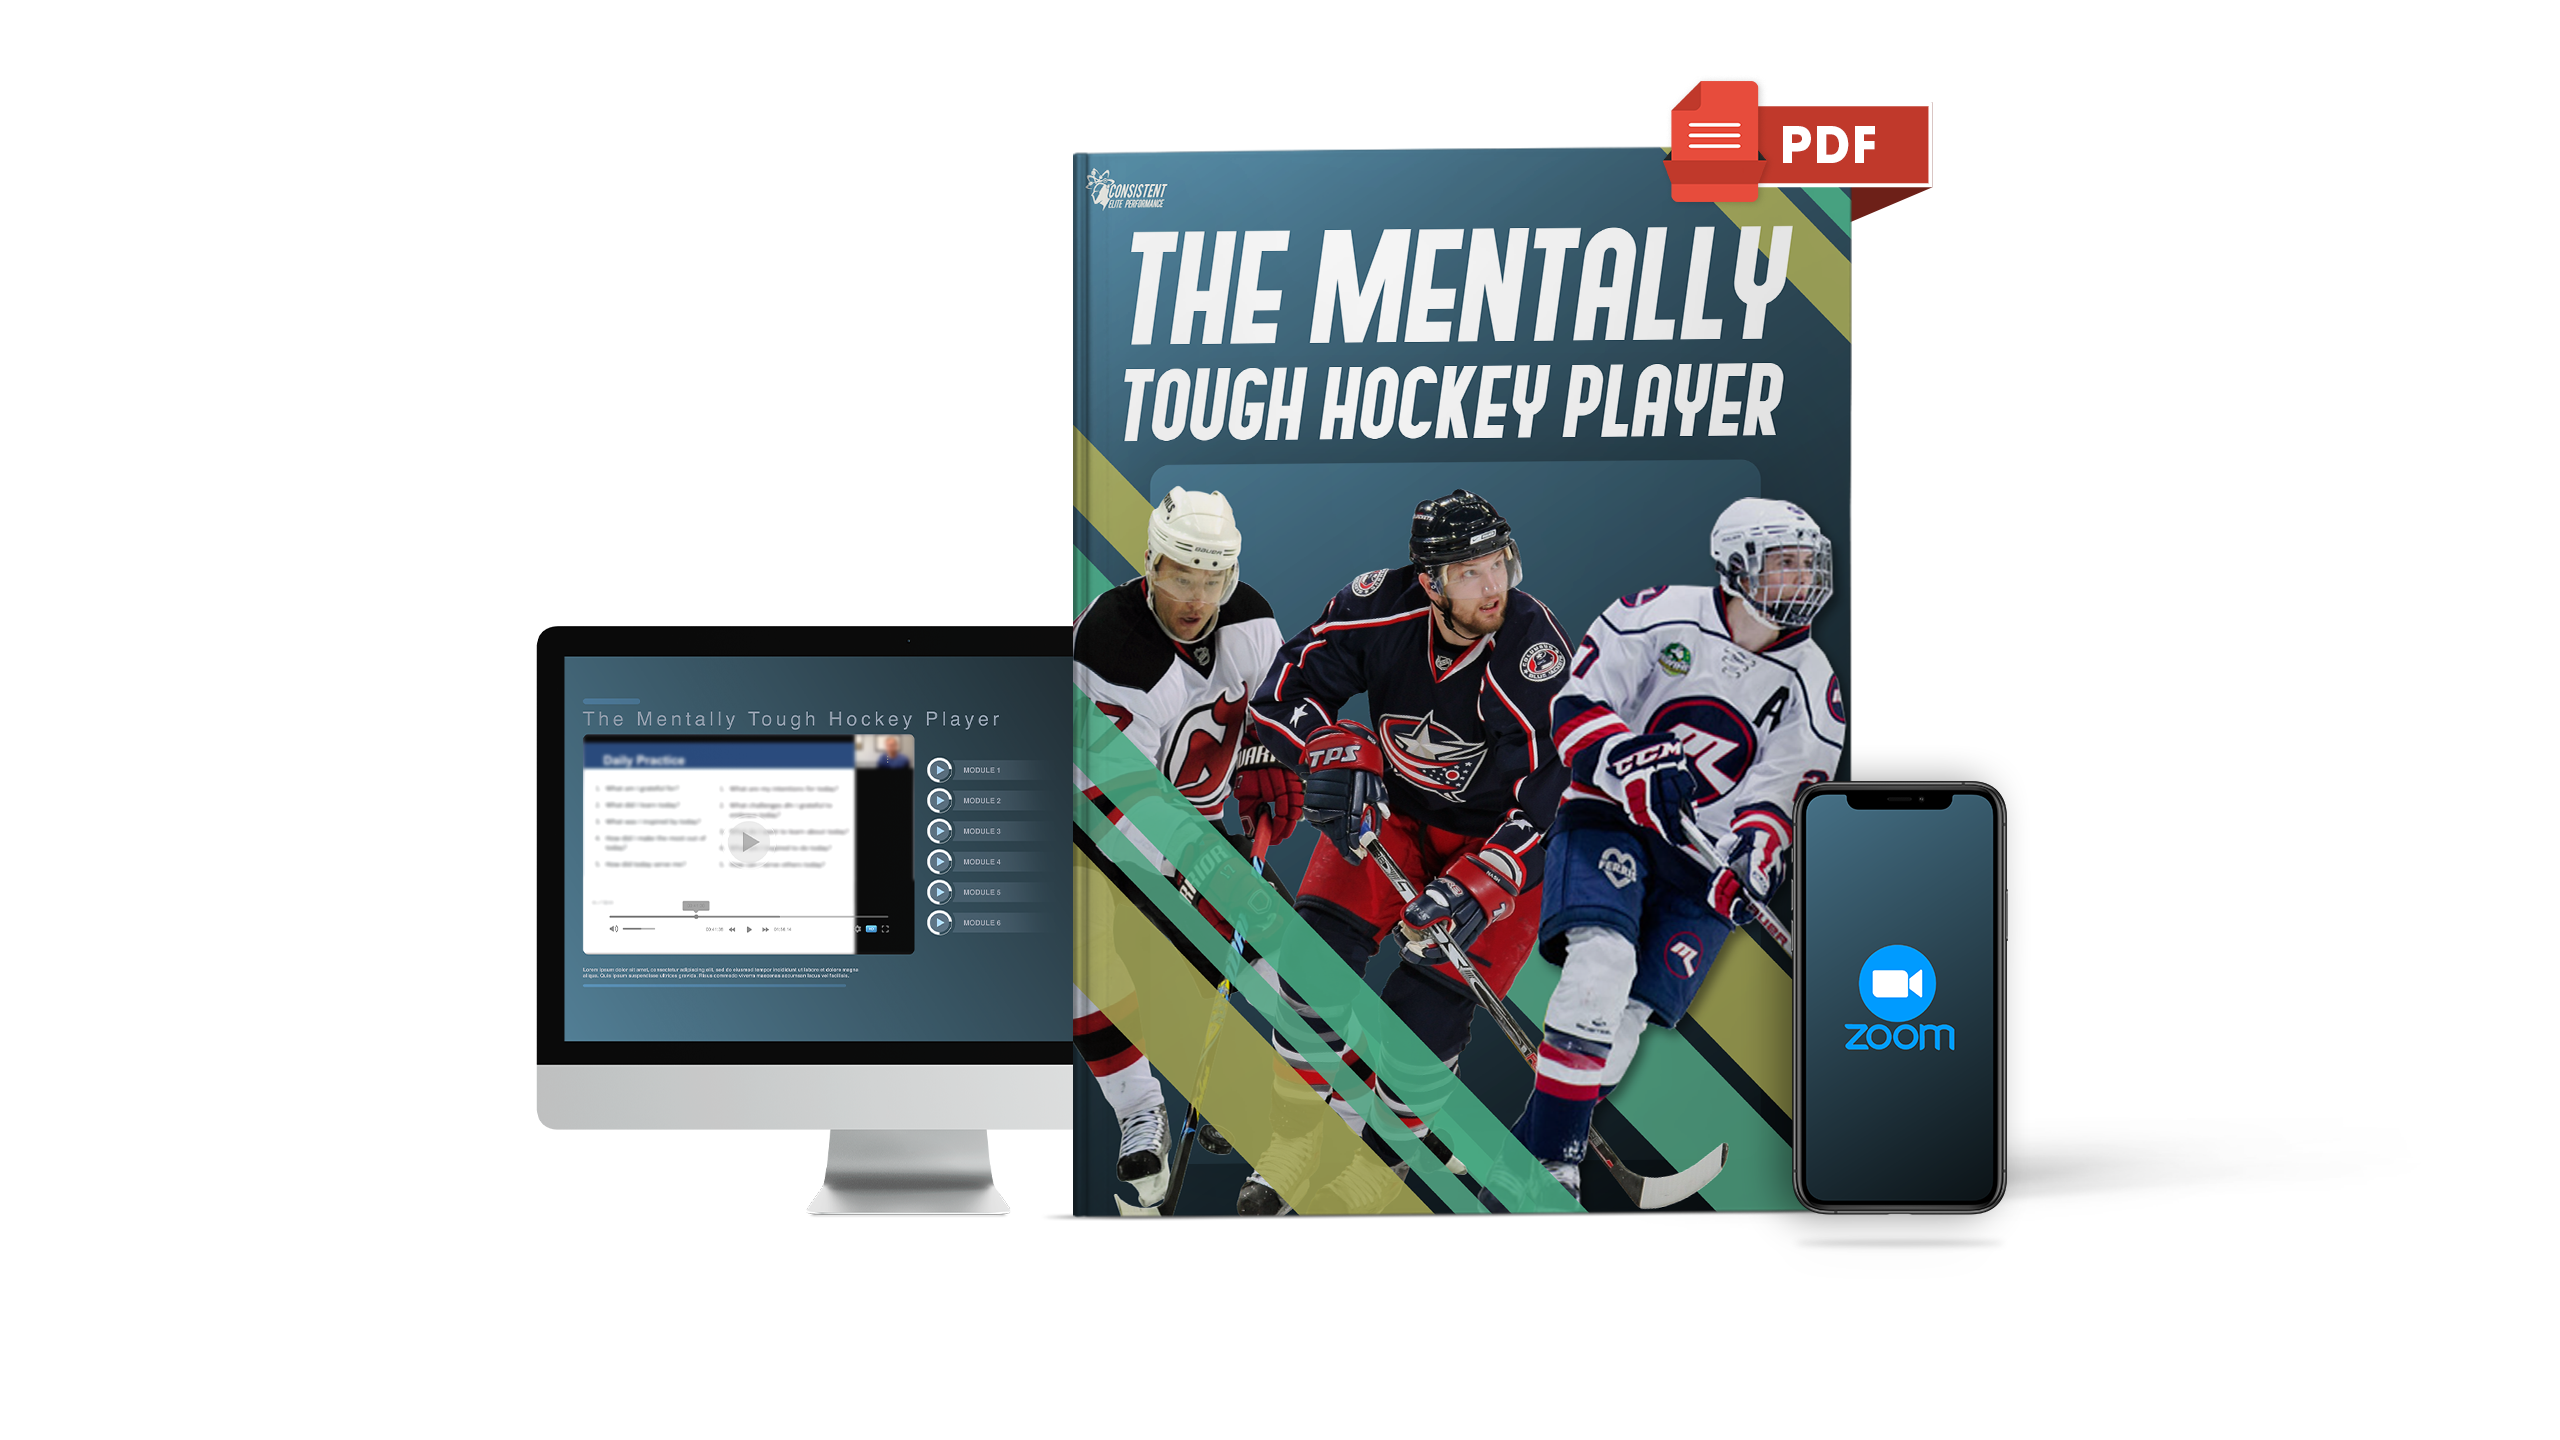 The Mentally Tough Hockey Player